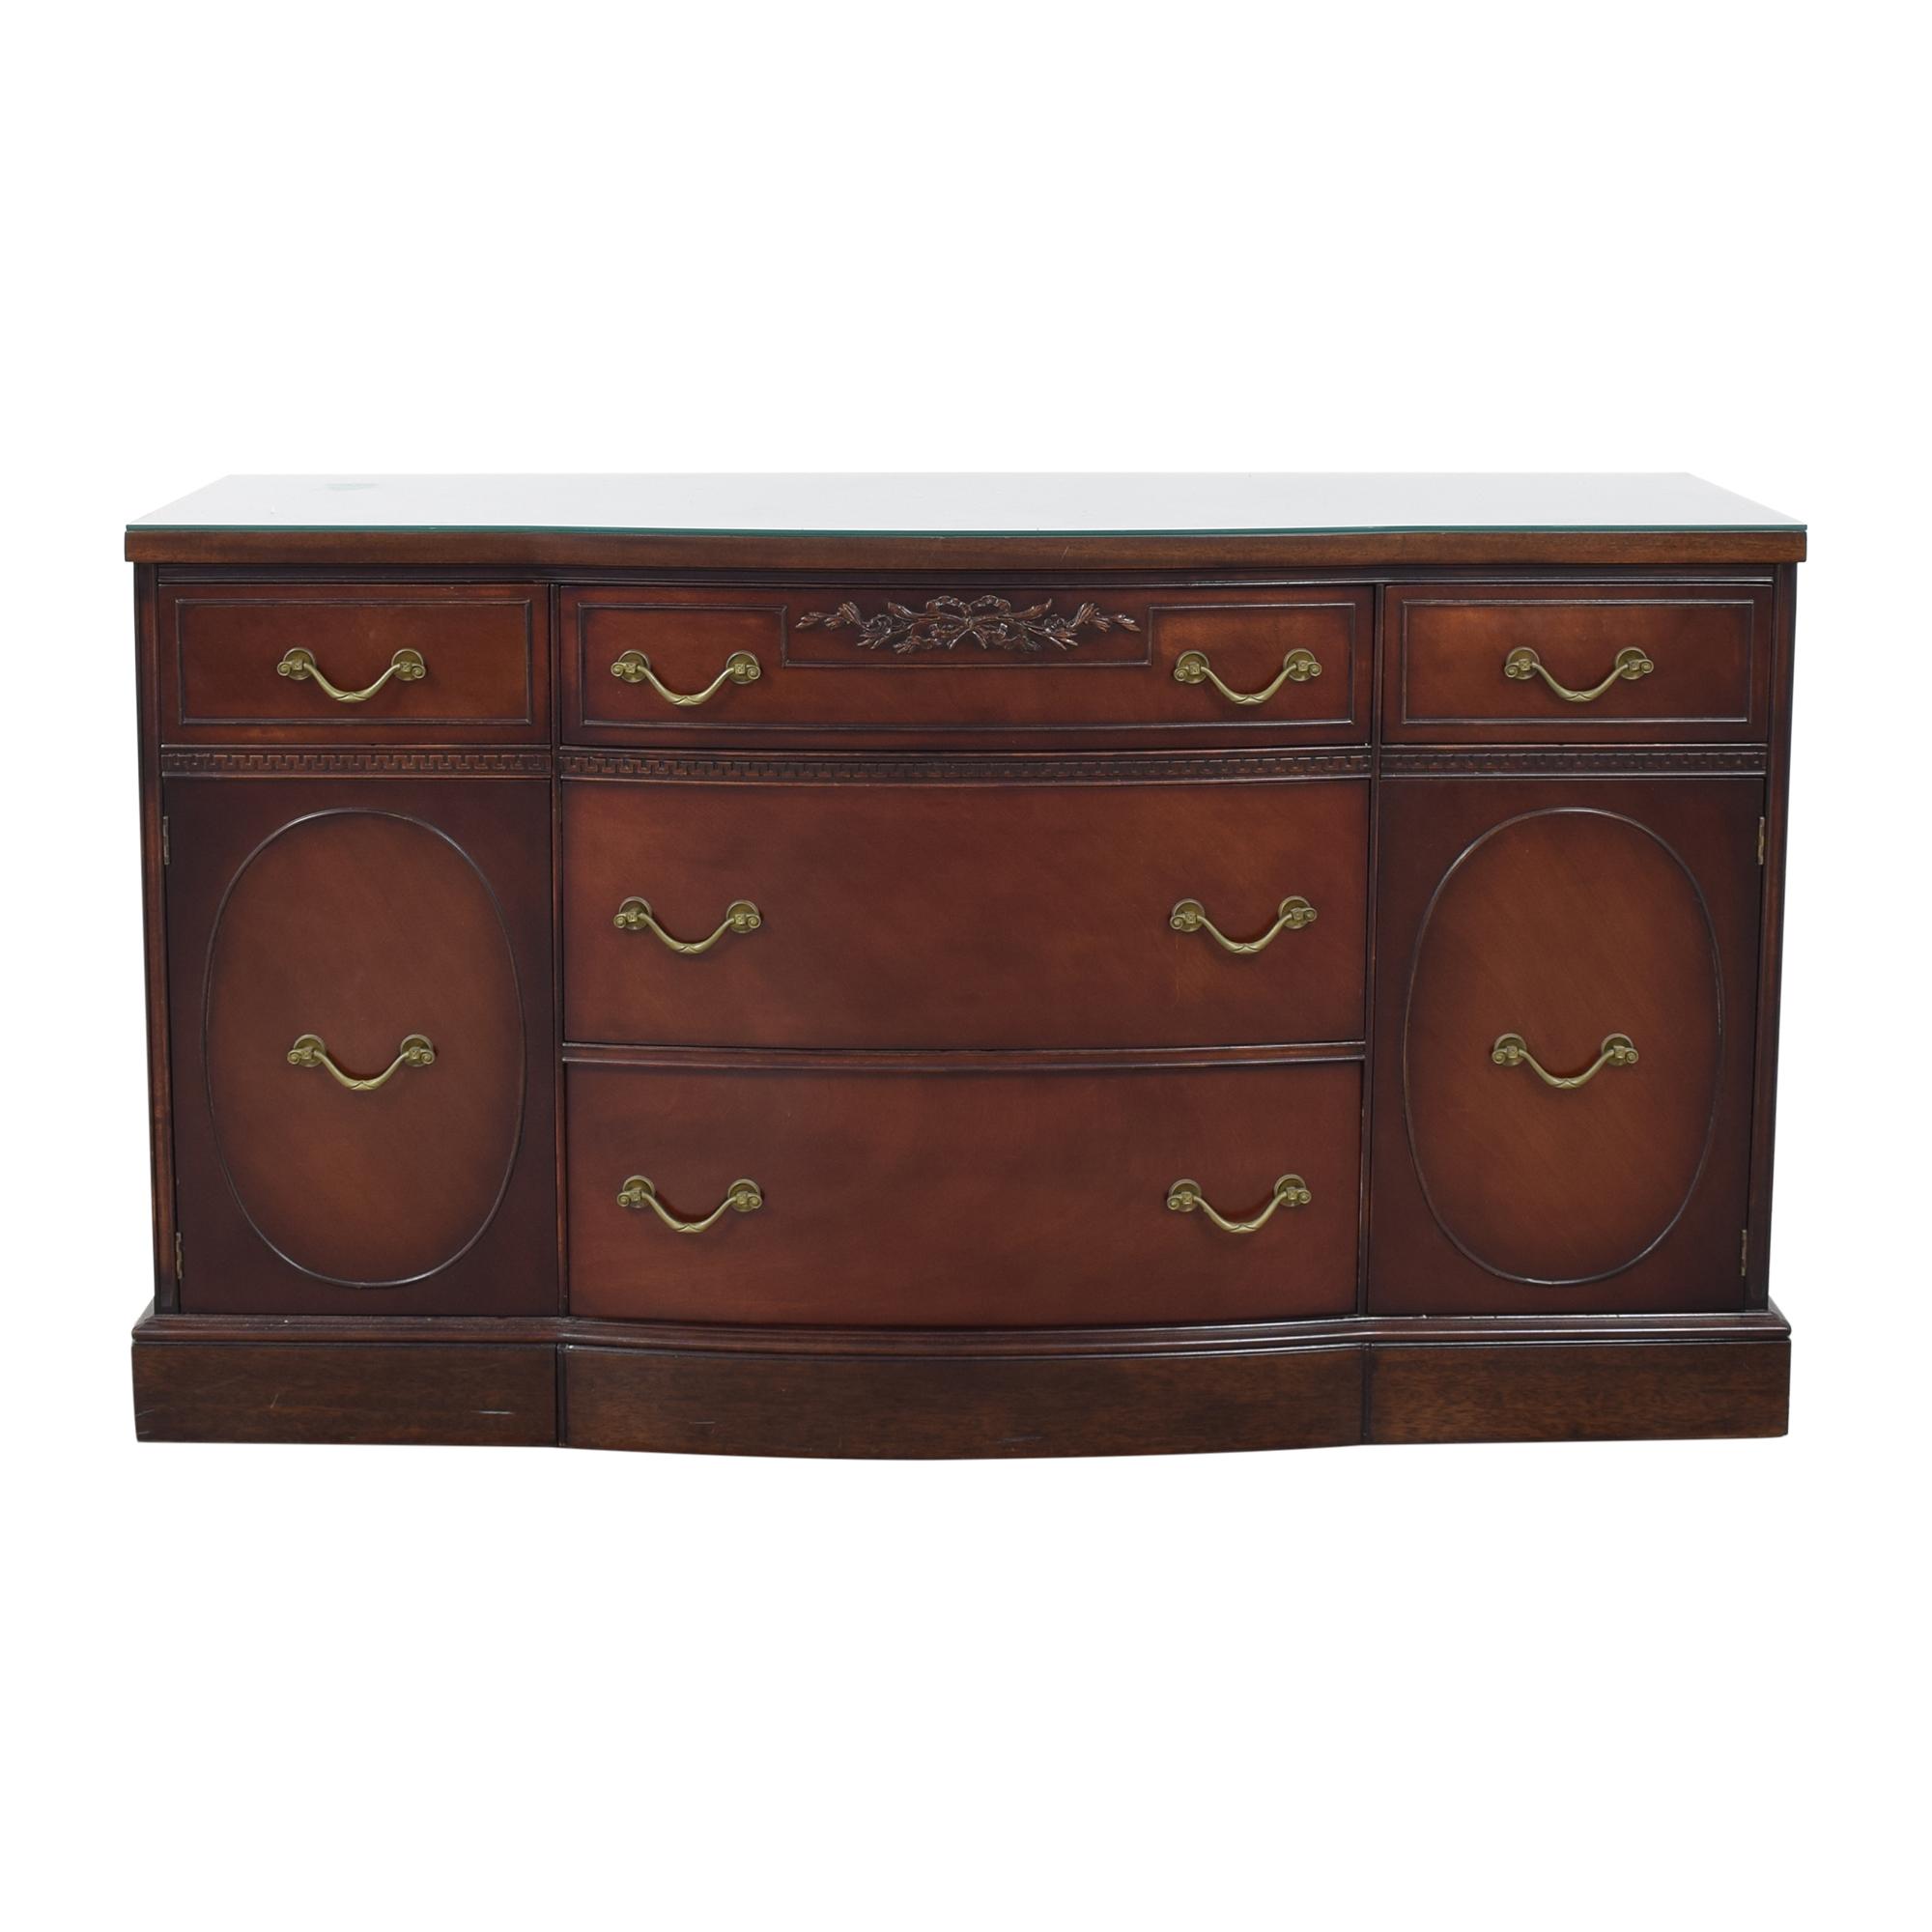 Five Drawer Sideboard / Storage